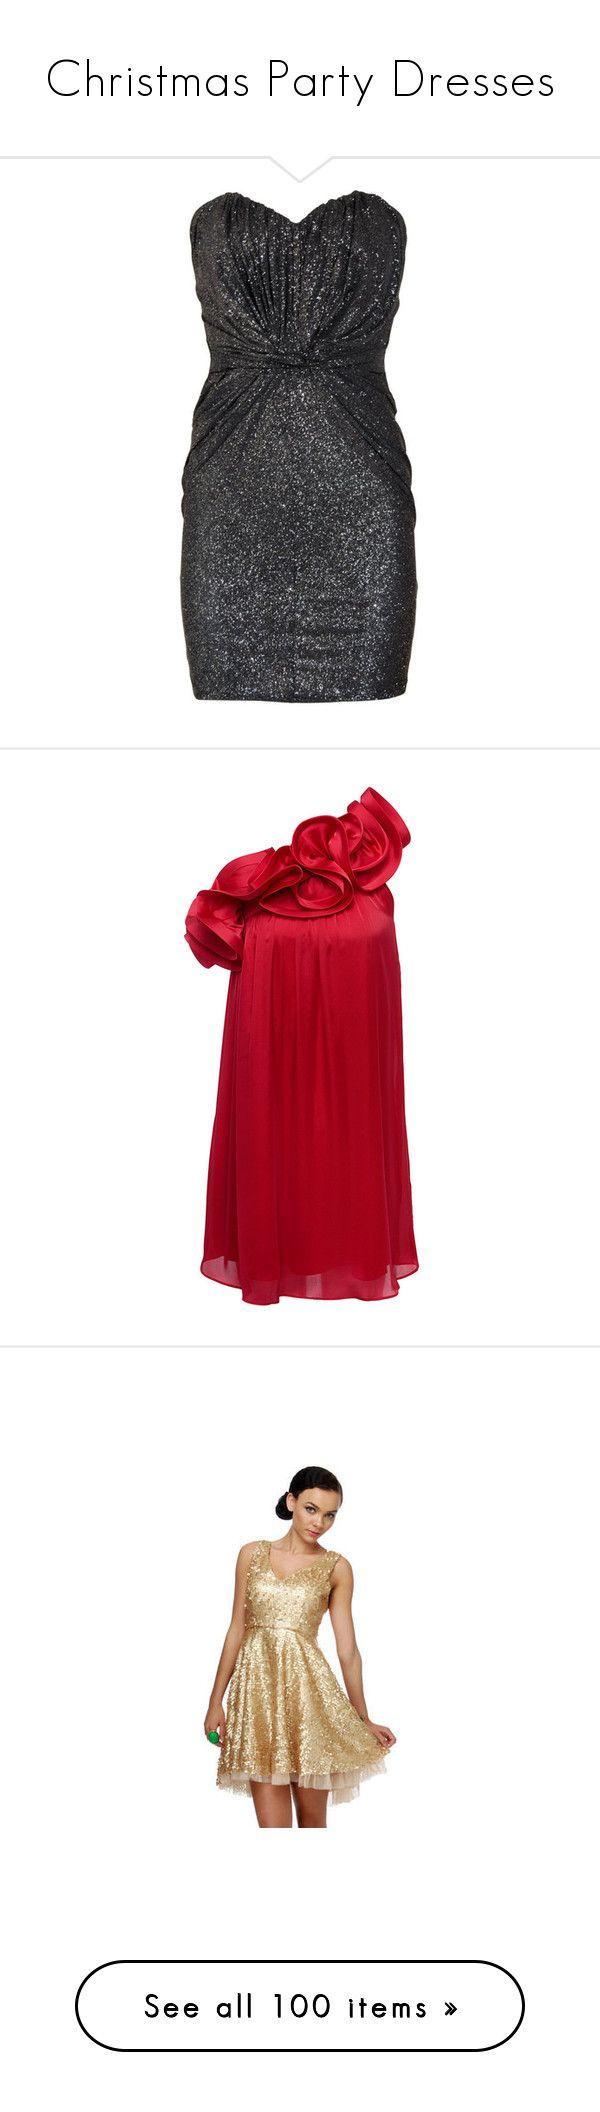 """Christmas Party Dresses"" by catt-perry ❤ liked on Polyvore featuring dresses, vestidos, vestiti, short dresses, women, mini dress, twist front dress, short glitter dresses, glitter mini dress and sparkly mini dress"